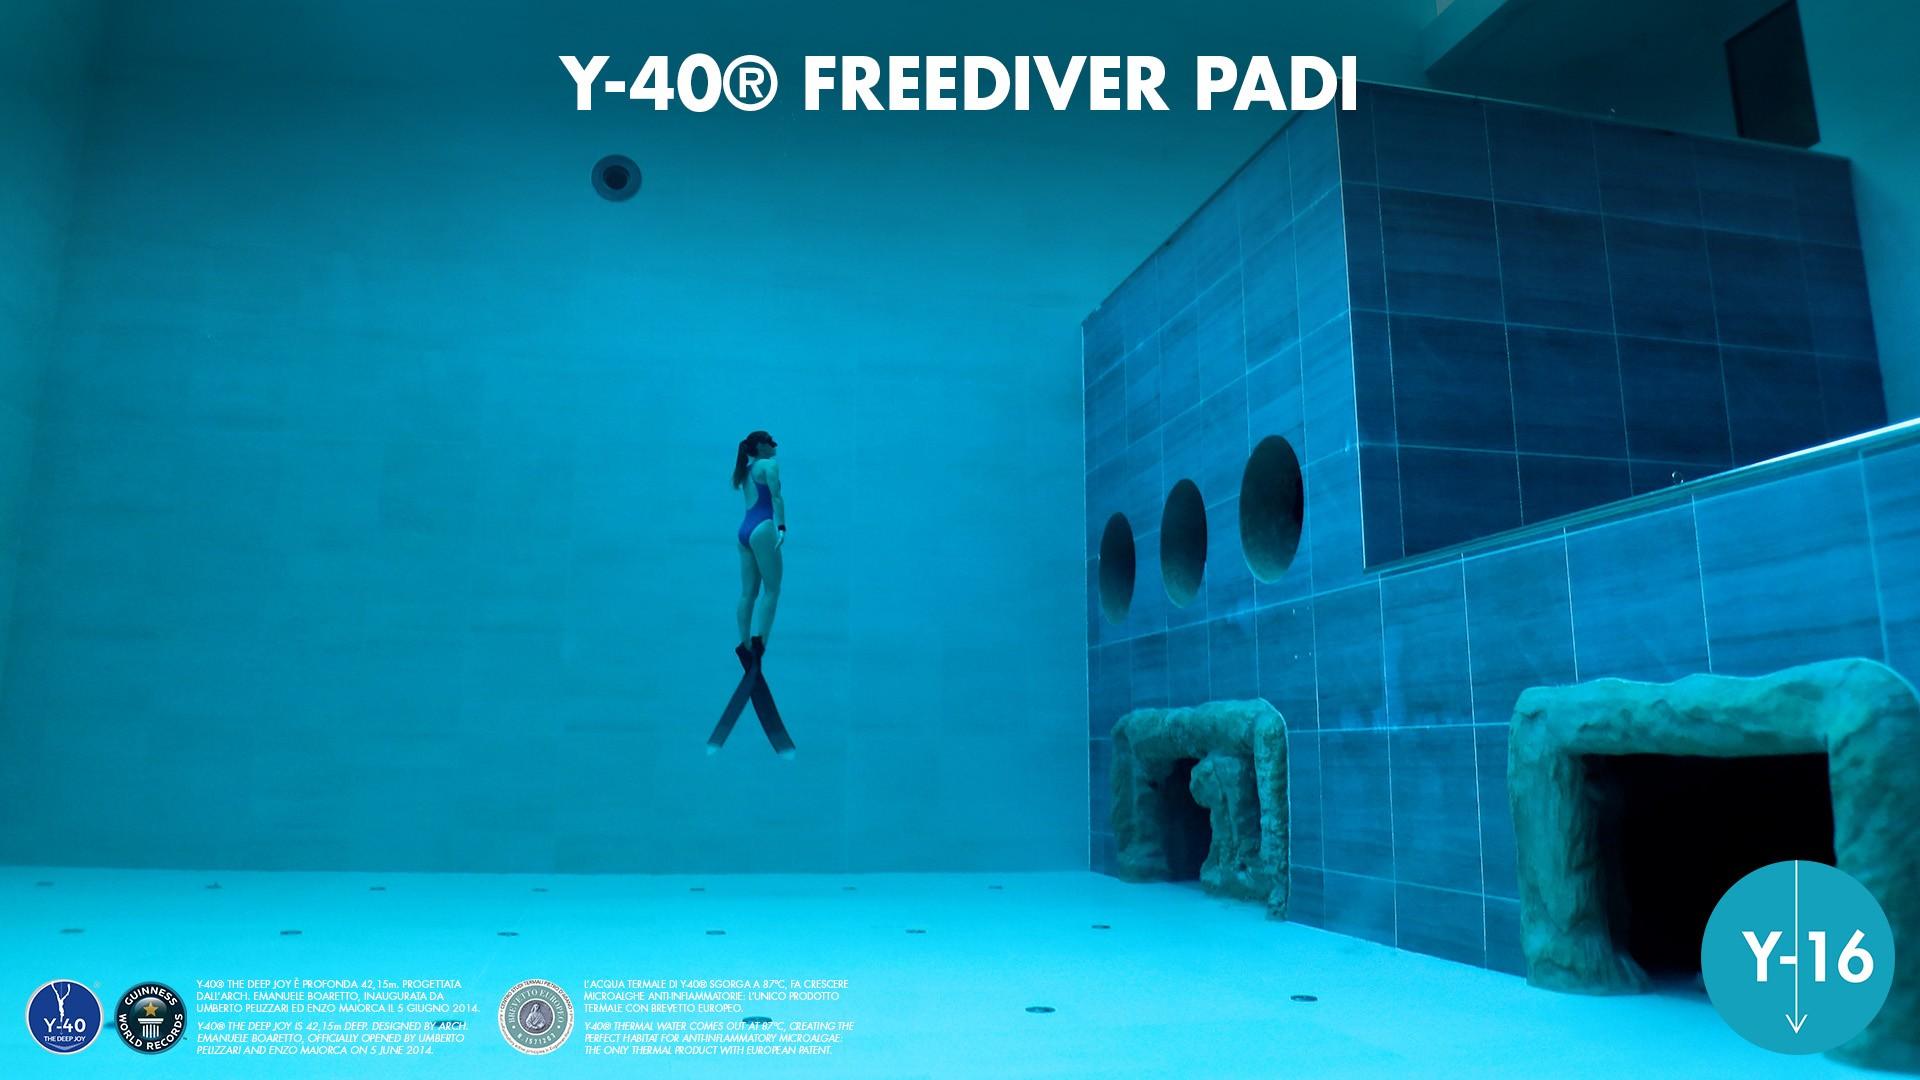 Padi Freediver Course In Y